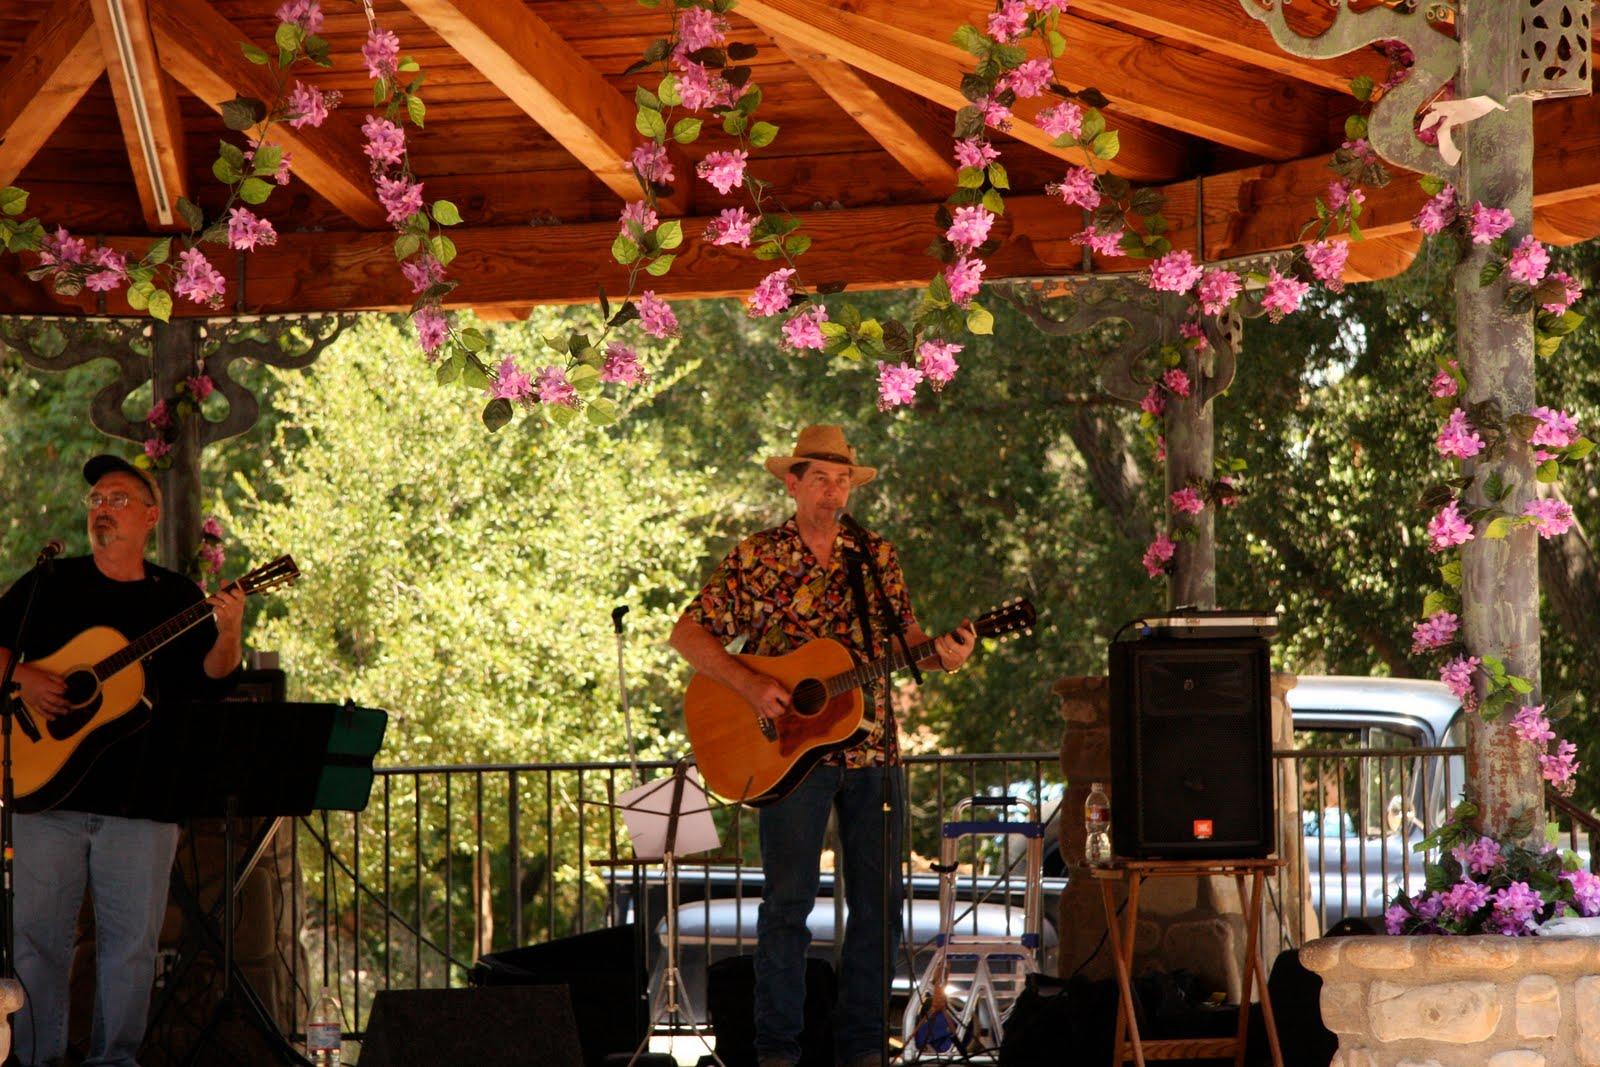 Hosting the Ojai Valley Lavender Festival 6/26/10, guys singing